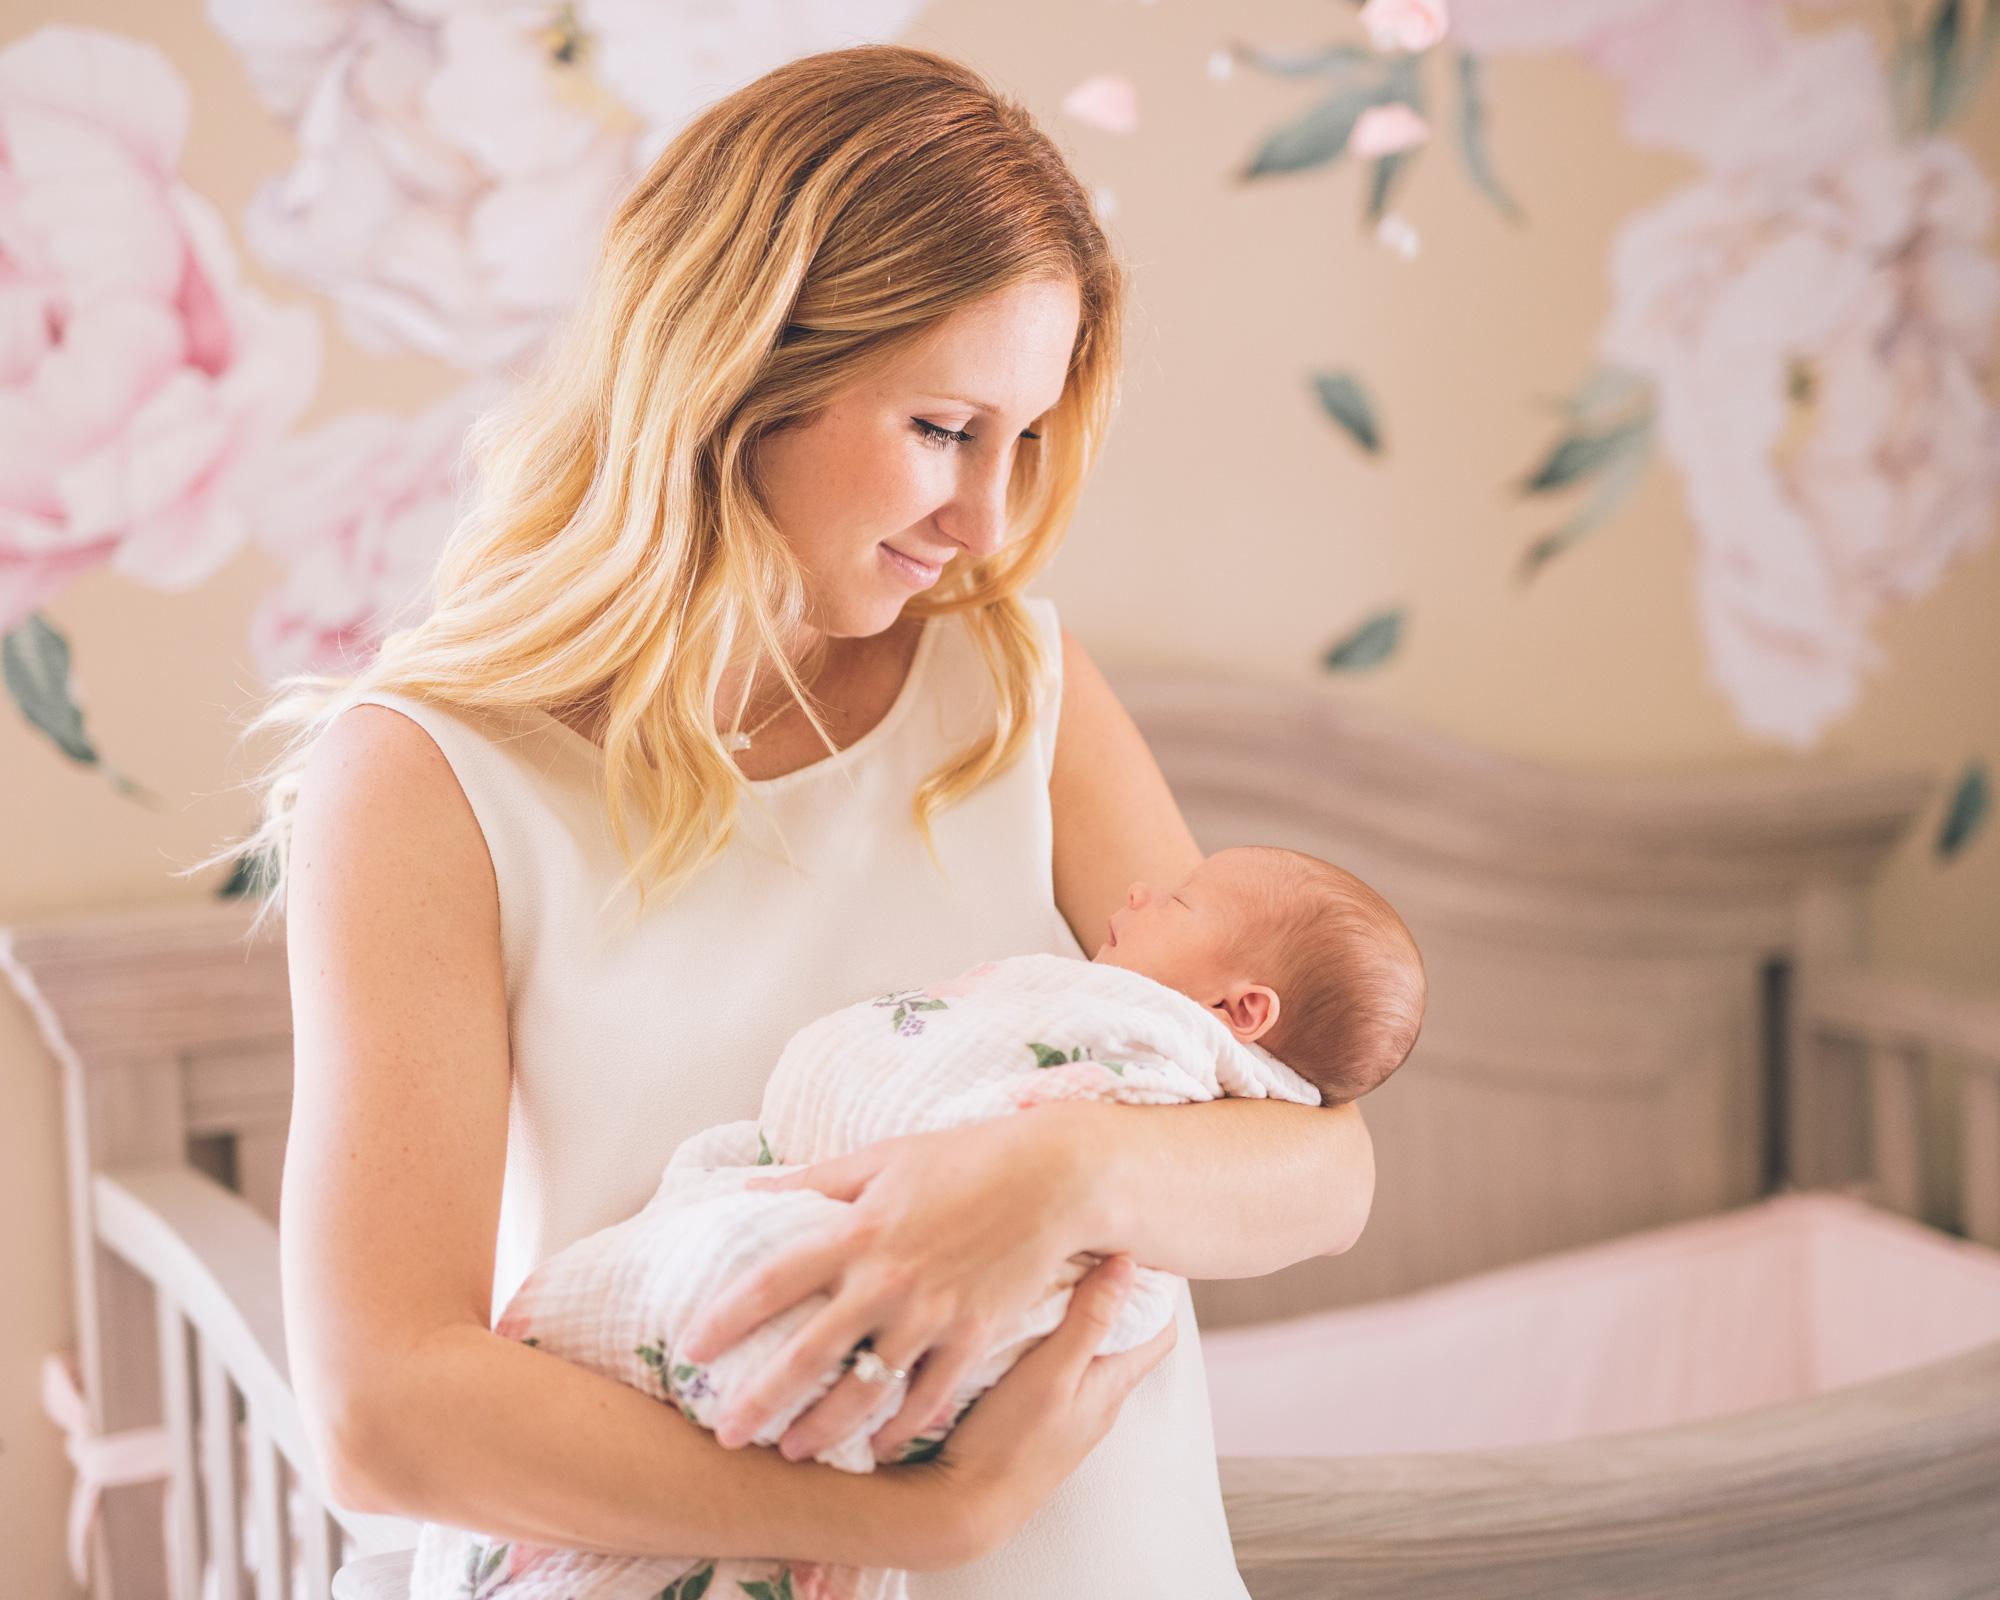 mother-holding-her-baby-daughter-in-a-beautiful-walnut-creek-nursery.jpg